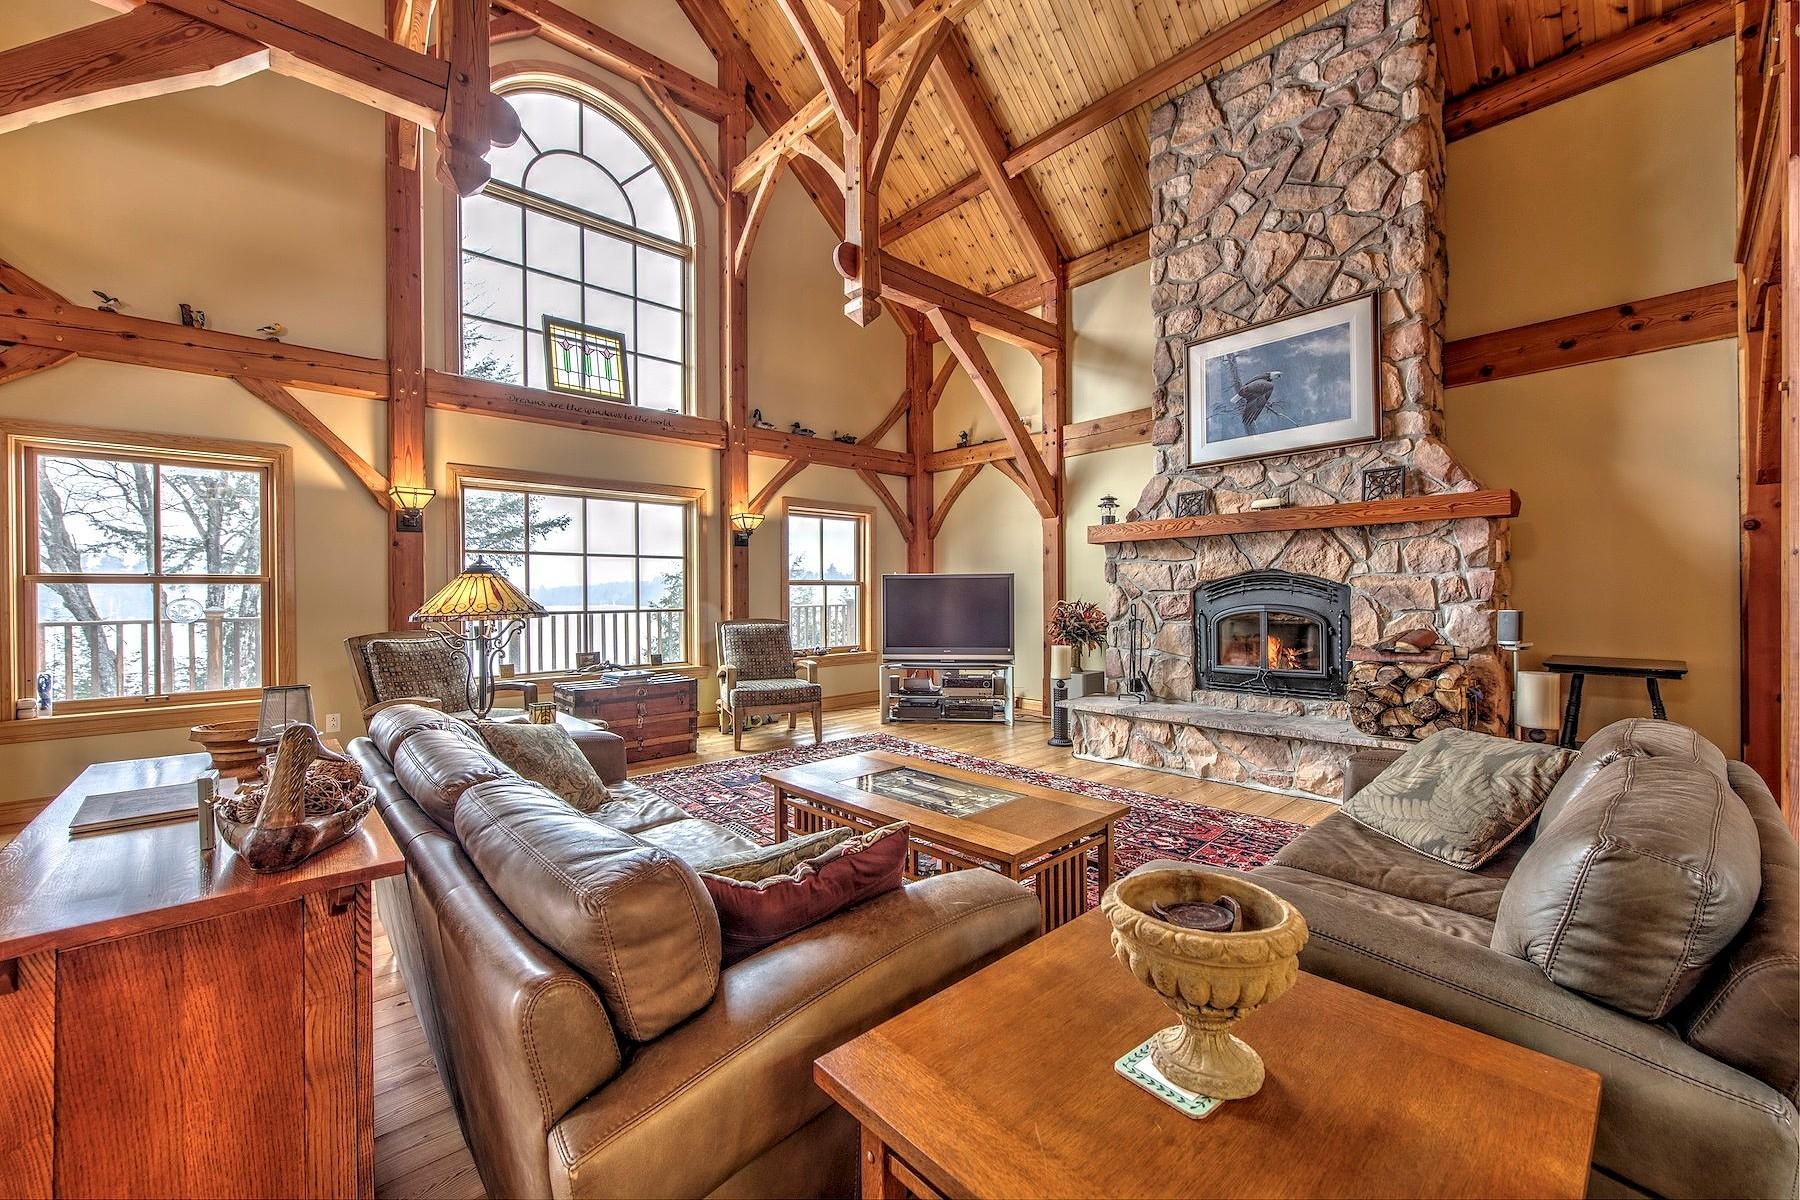 Частный односемейный дом для того Продажа на Waterfront Lac Clair 525 Ch. des Lac Clair, Lachute, Квебек, J8G2P2 Канада